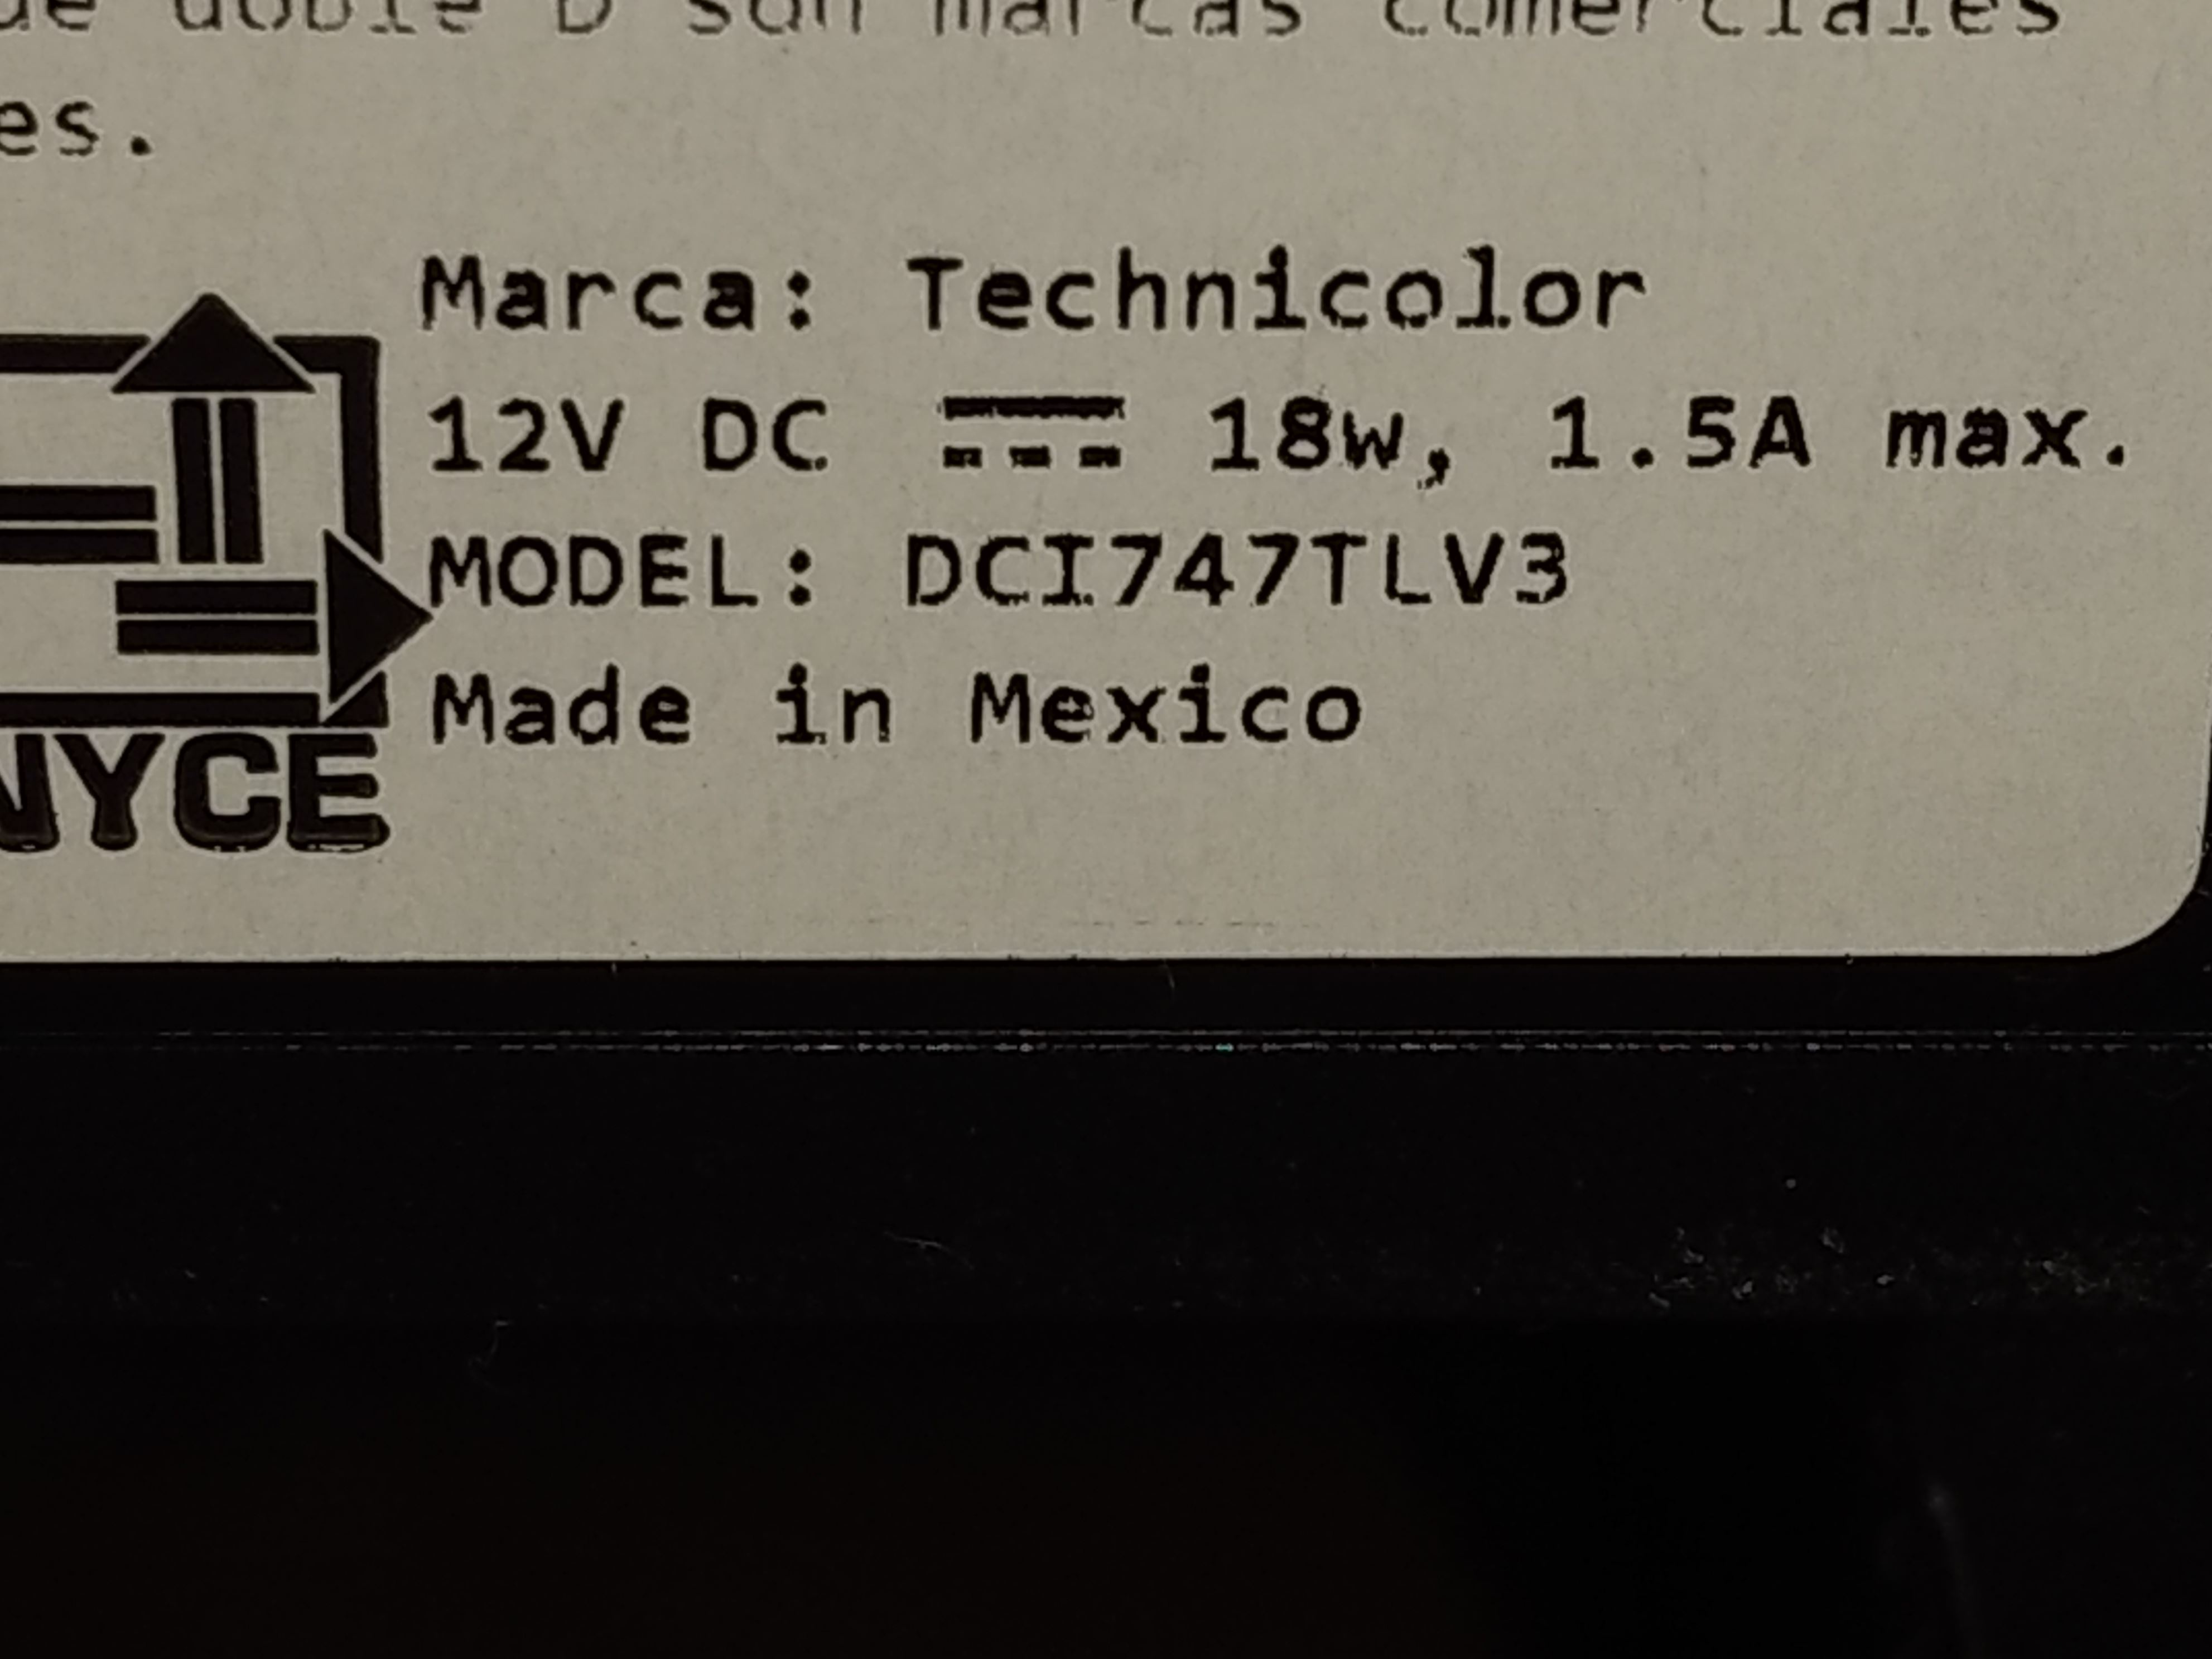 Technicolor: Configurar caja del cable DCI747TLV3 de Izzi [Translation-Set up cable box Izzi ... [IMG]